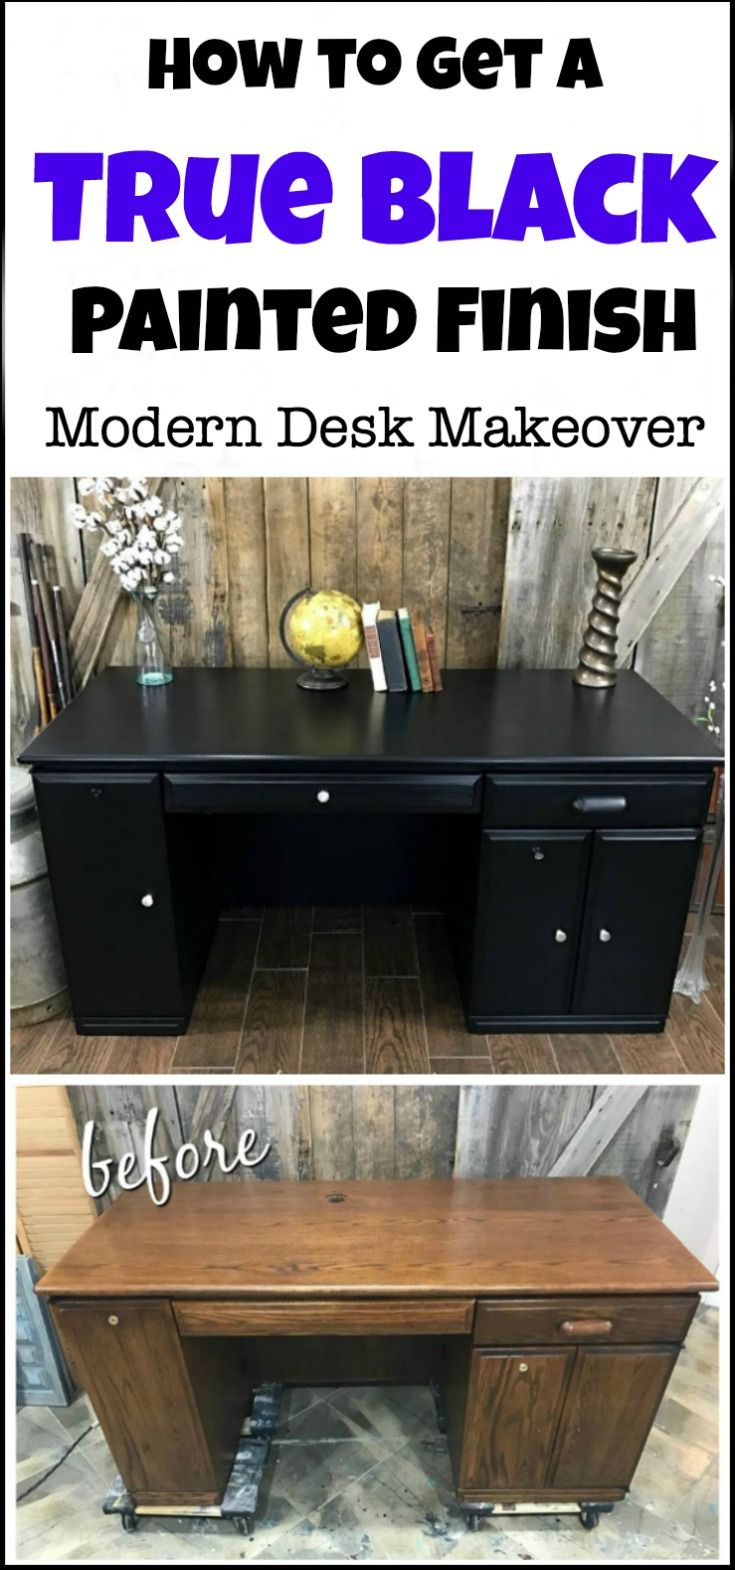 A Moderm Desk Makeover In True Black Black Painted Furniture Black Chalk Paint Furniture Desk Makeover